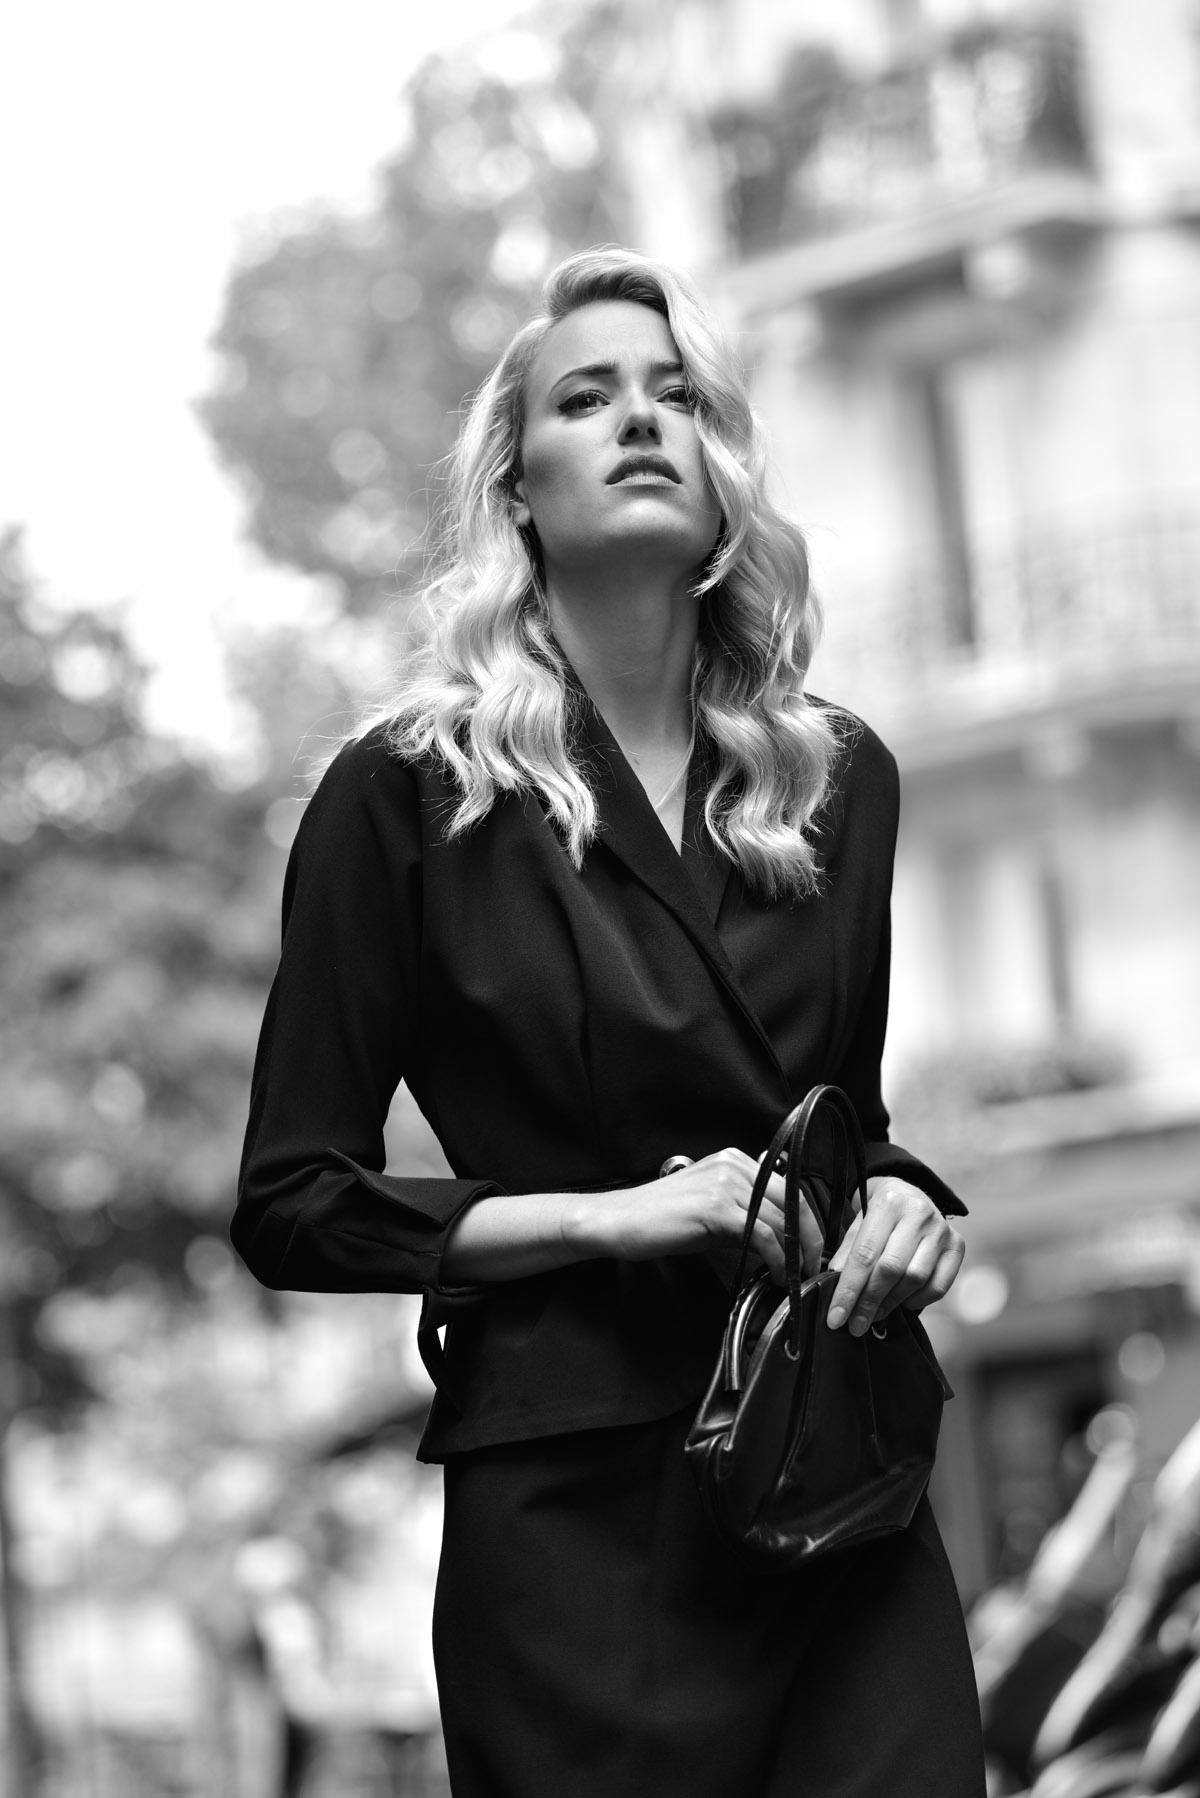 Paris Female couple Editorial - nouvelle Romance homage by Peter Mueller Photography 9